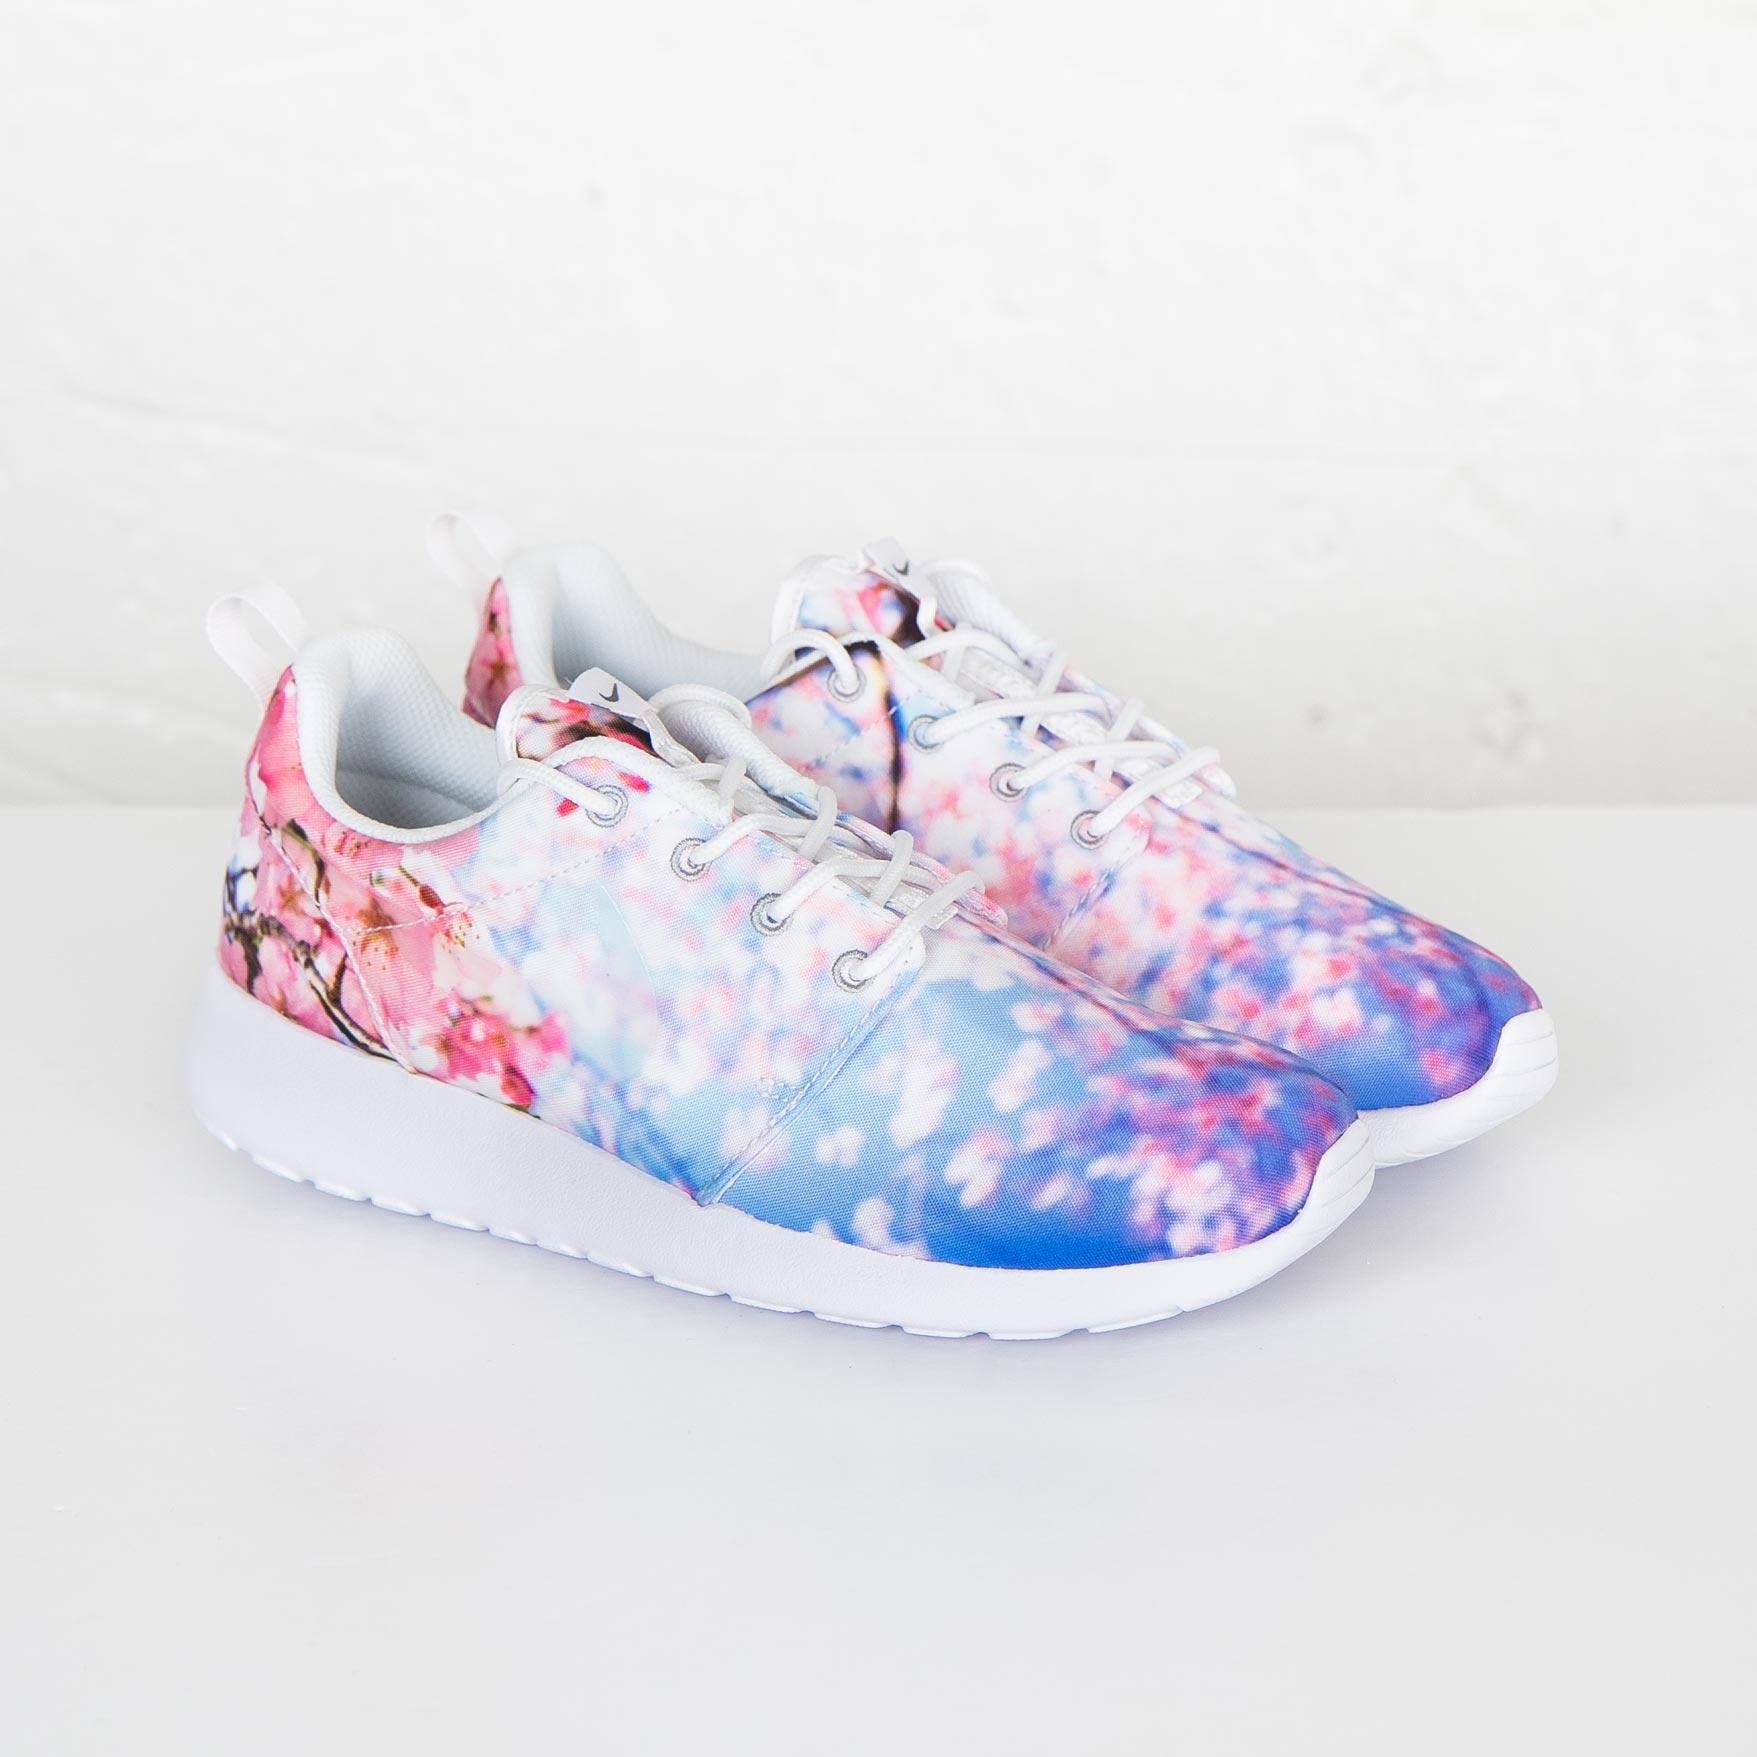 Nike Wmns Roshe One Cherry Blossom White Pure Platinum Women's Running Shoes 819960 100